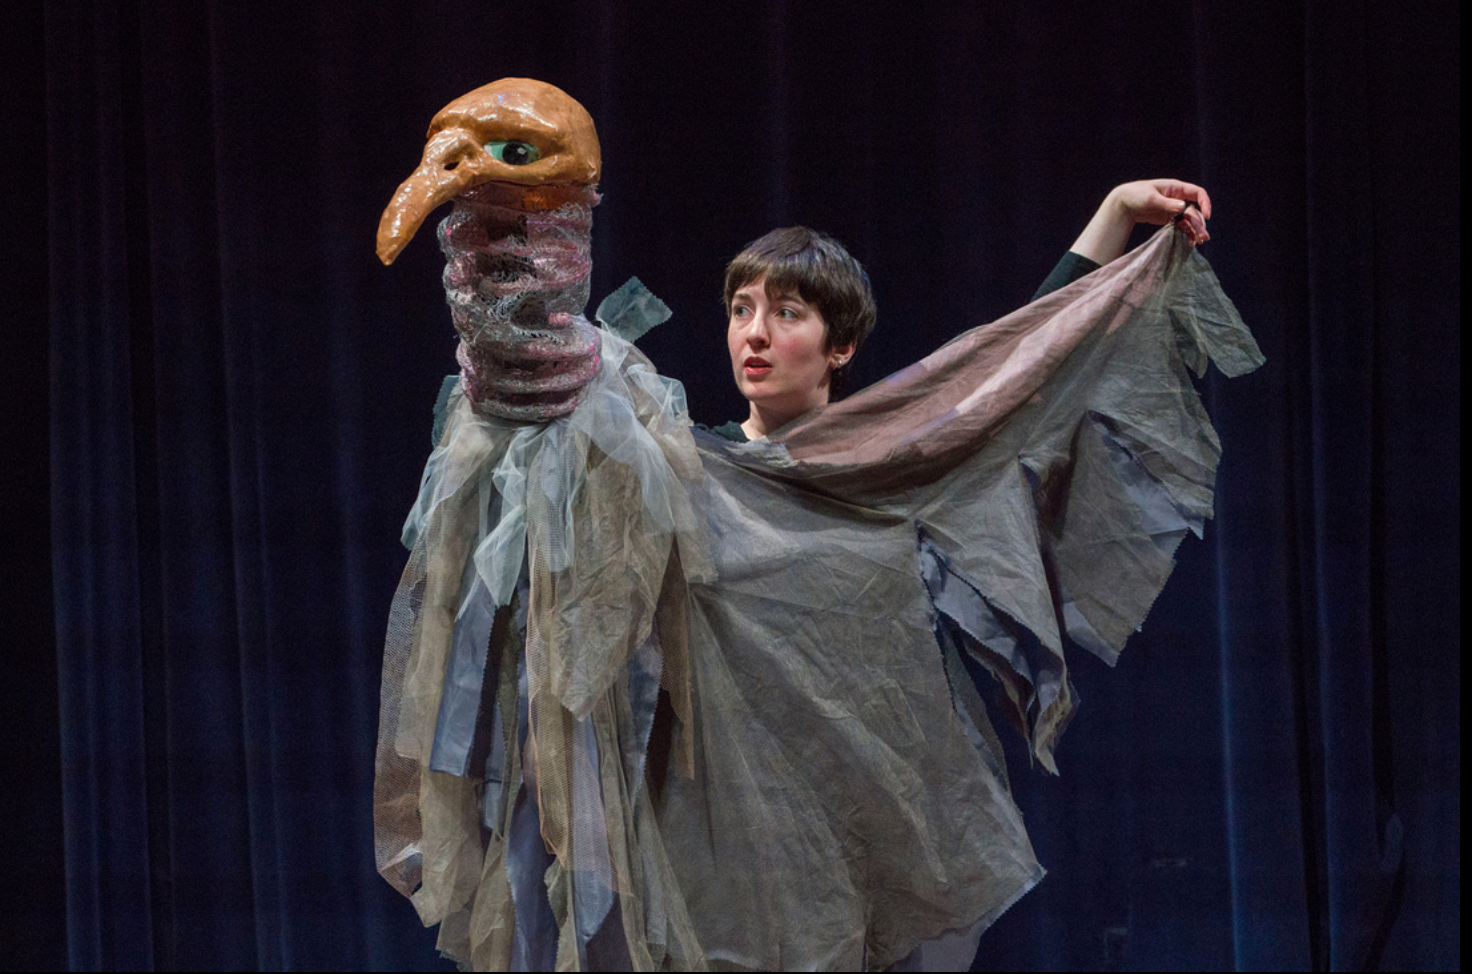 Vulture Performance